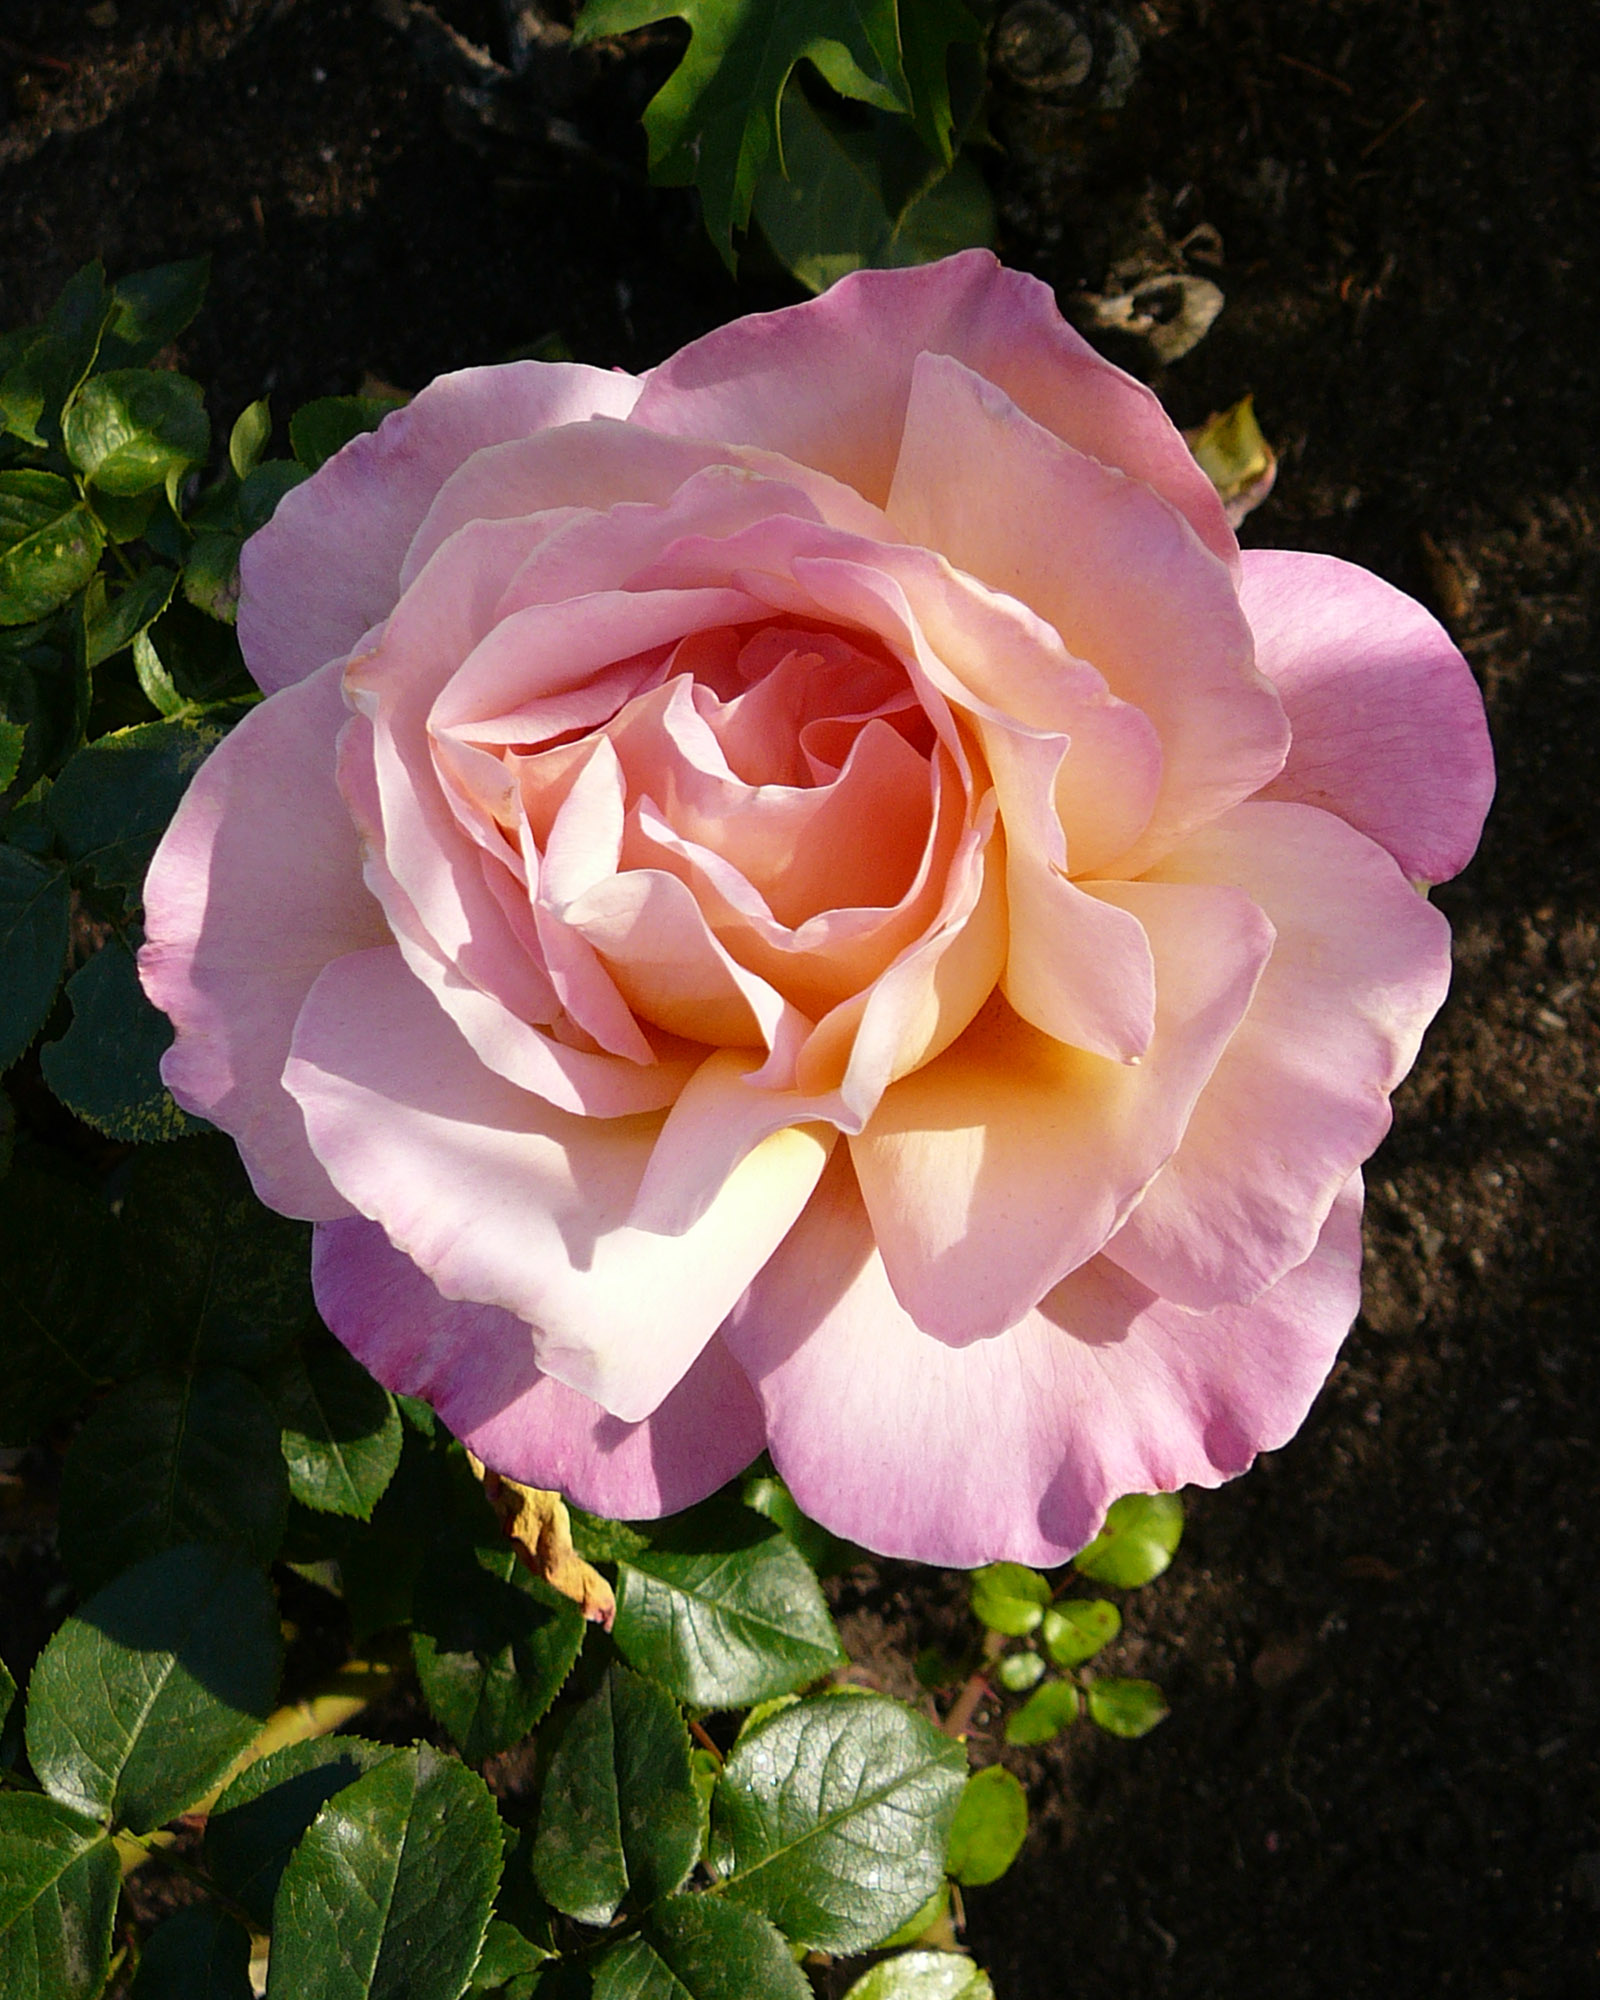 http://fc46.deviantart.com/fs32/f/2008/218/4/c/Pink_Rose_Flower_Stock_Photo_by_Enchantedgal_Stock.jpg